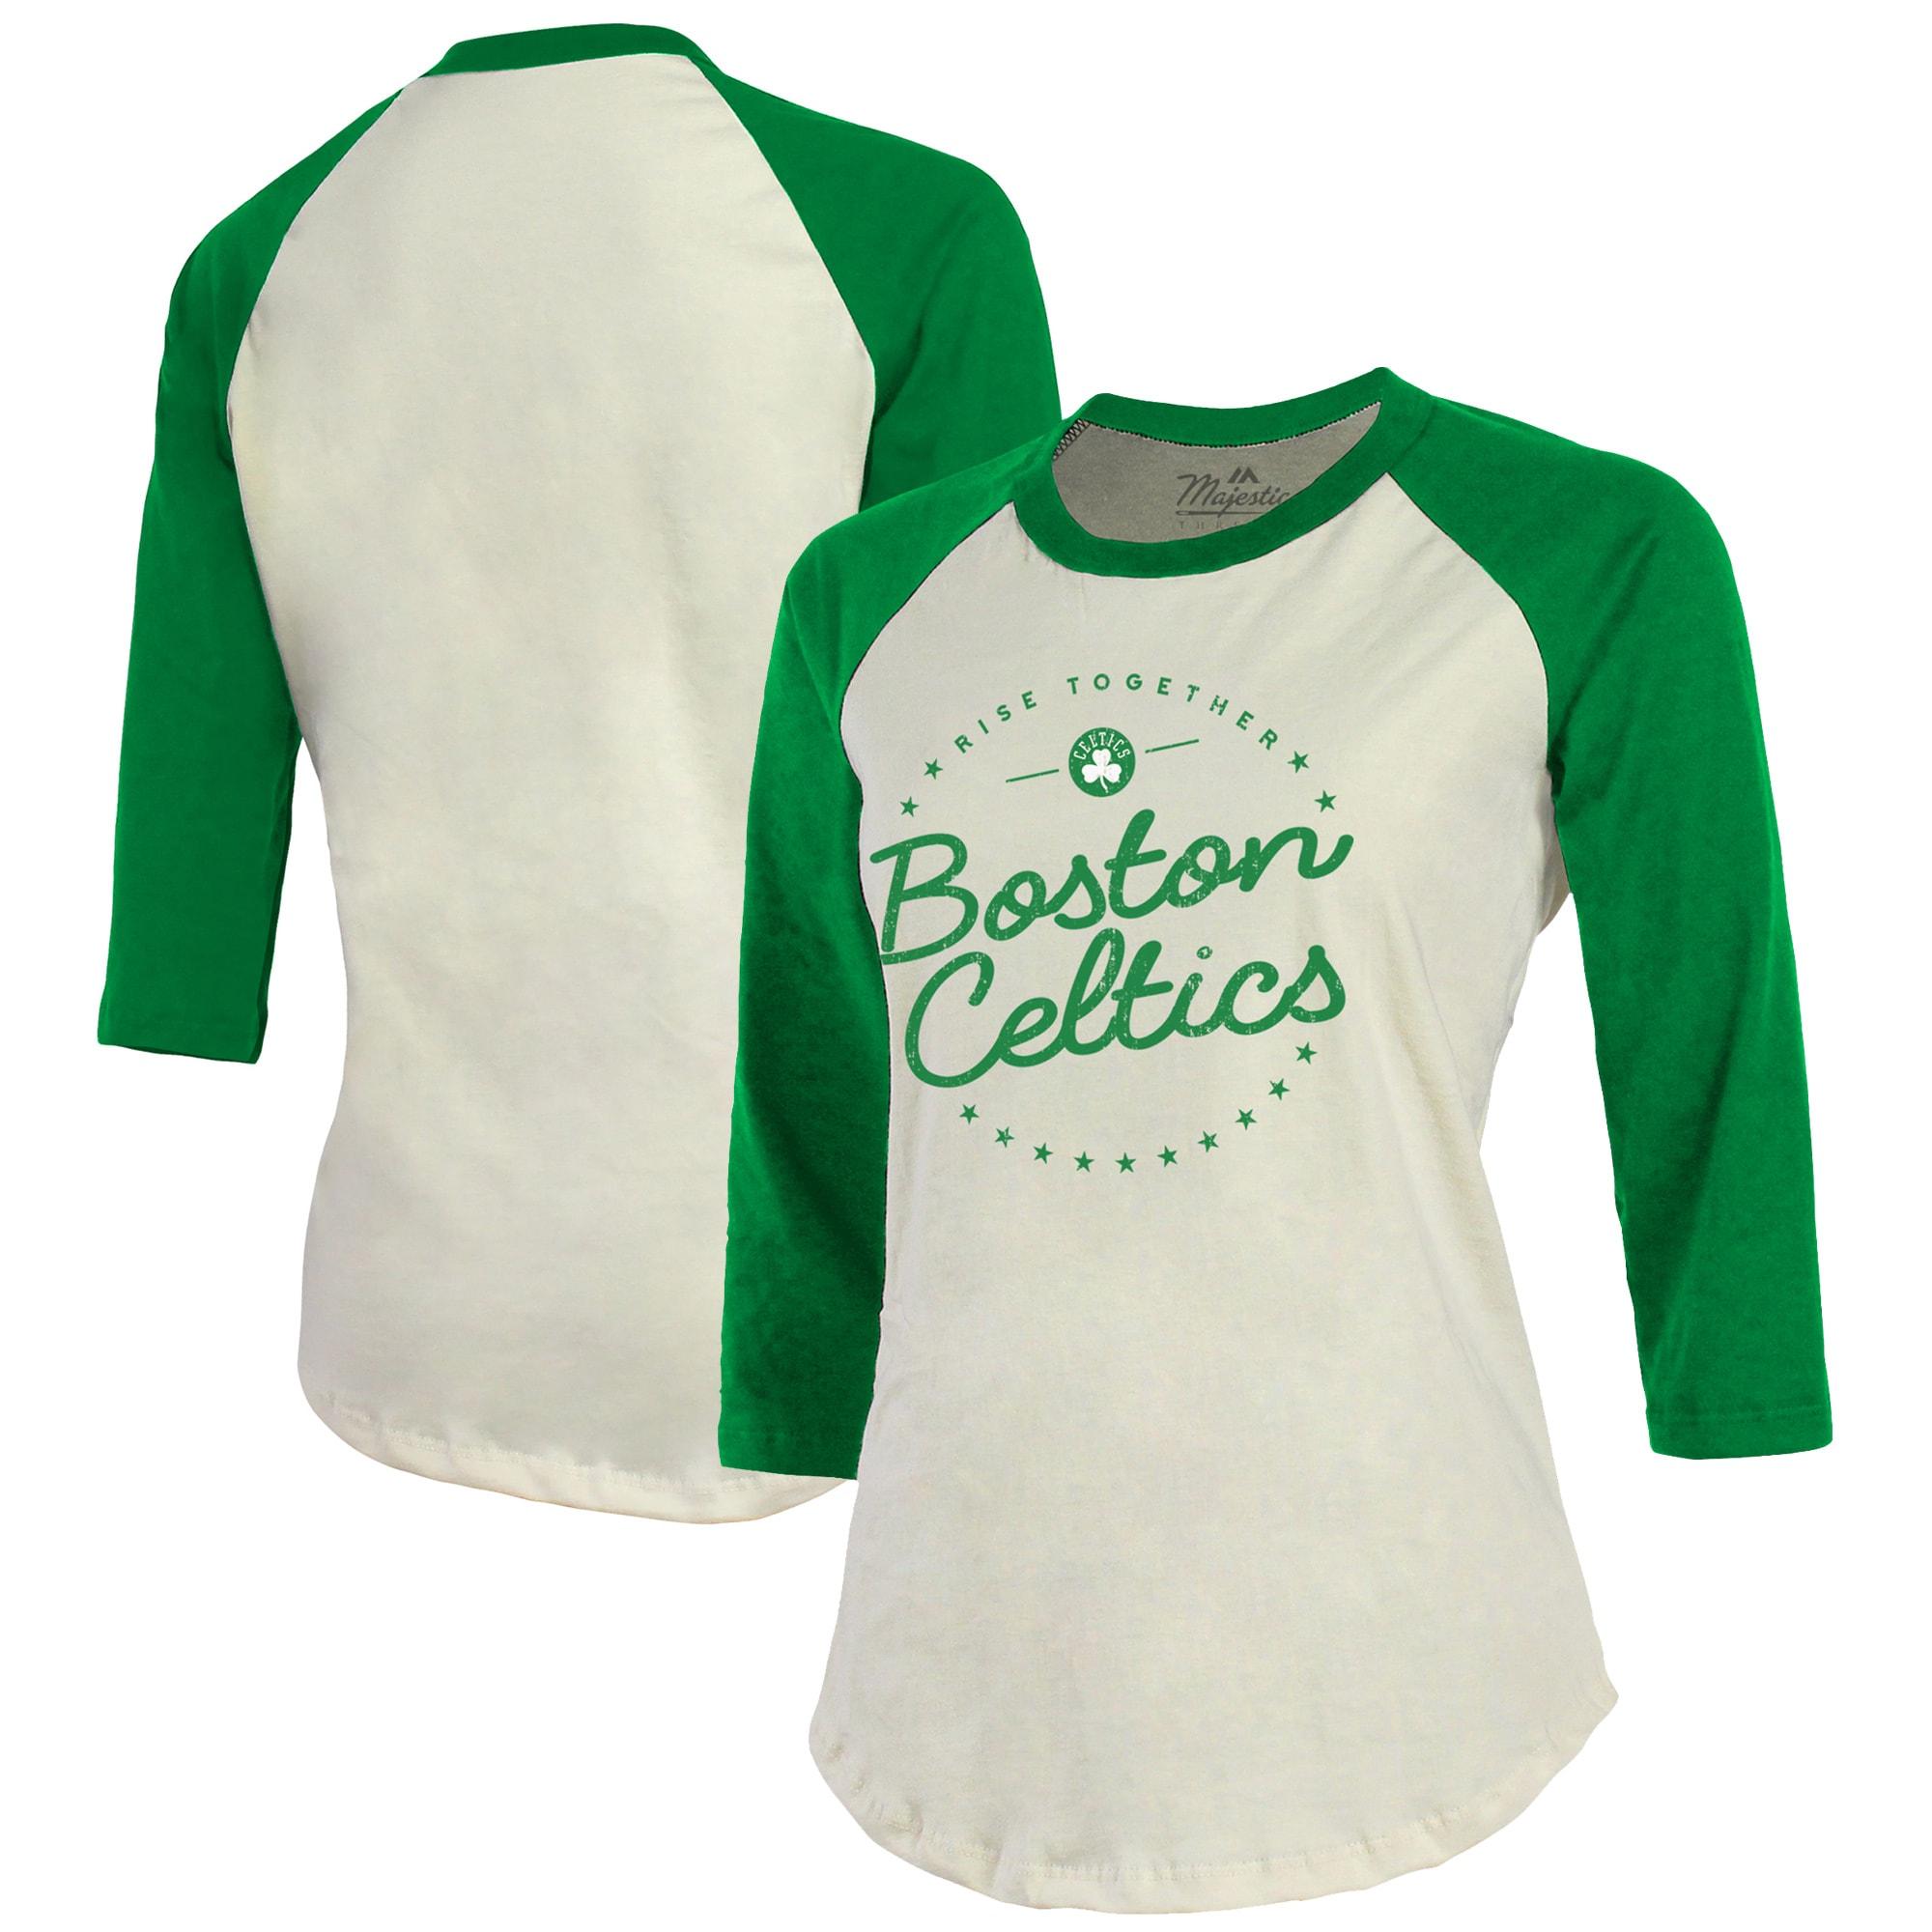 Boston Celtics Majestic Threads Women's Softhand 3/4-Sleeve Raglan T-Shirt - Cream/Kelly Green